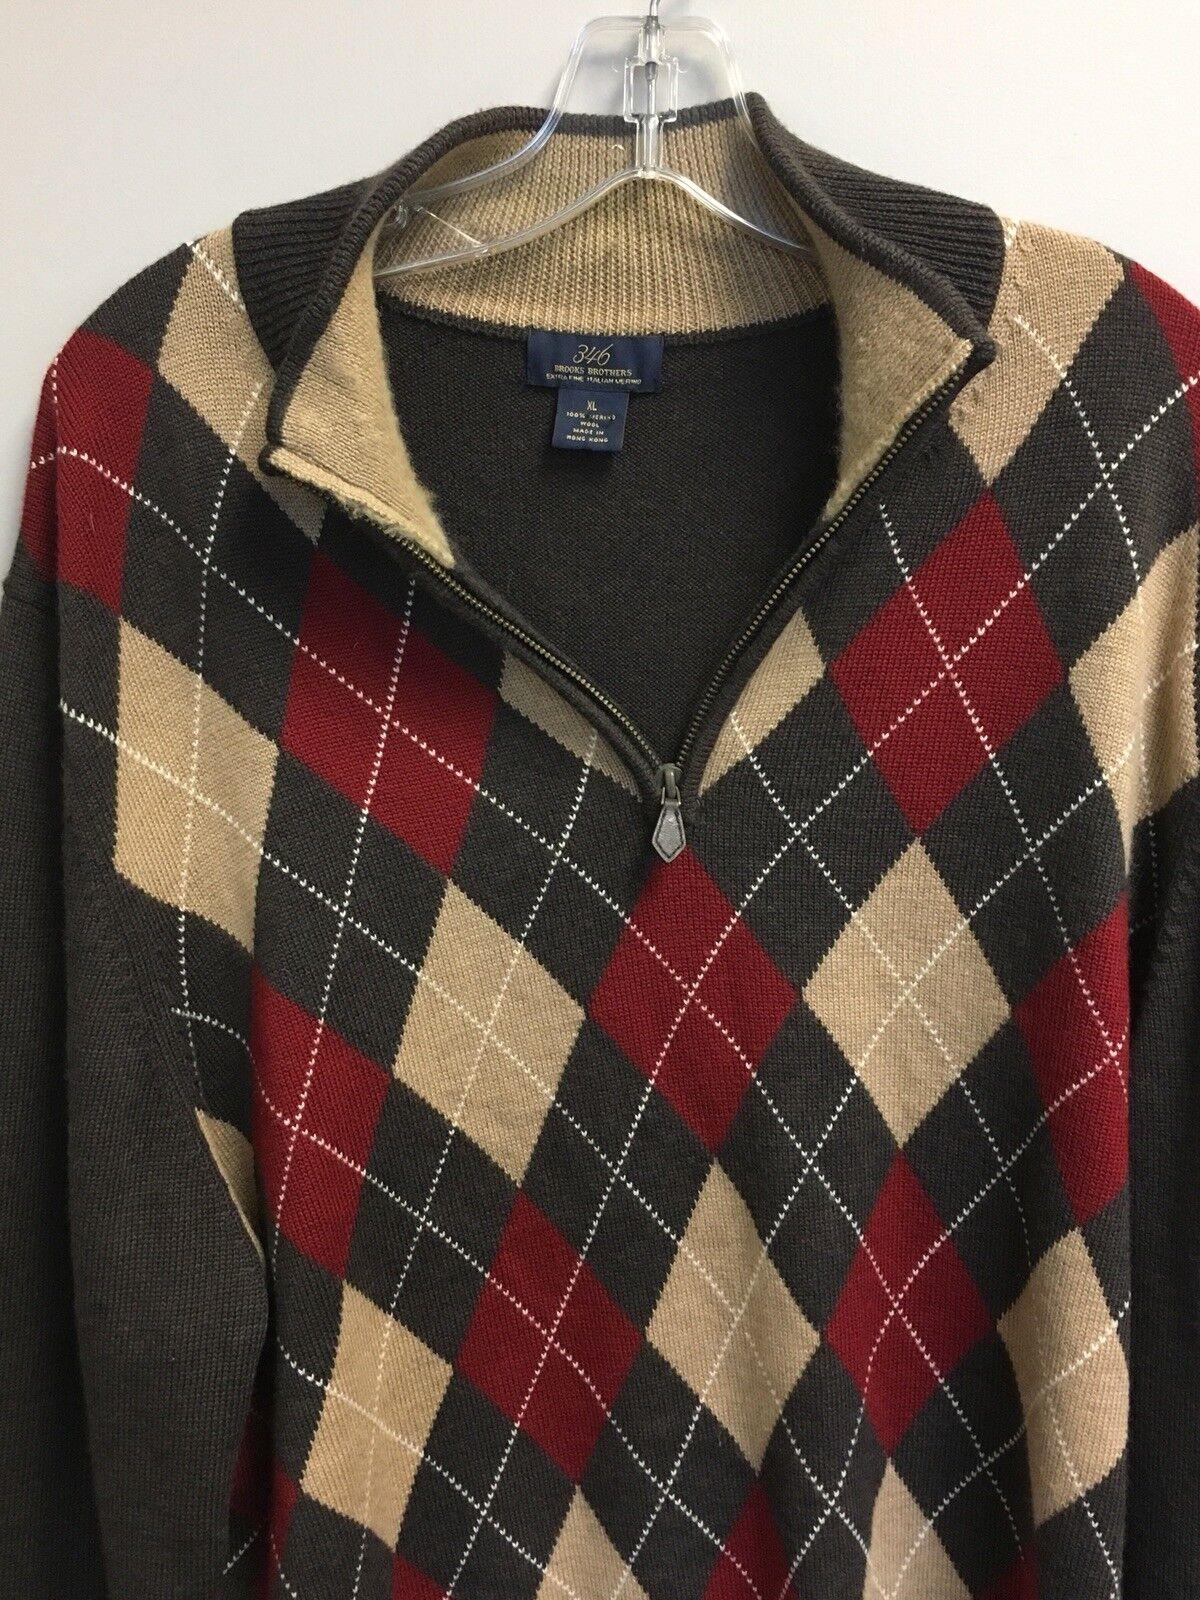 Brooks Bredhers 346 Brown Multi color Argyle Italian Merino Sweater Mid Zip Nice